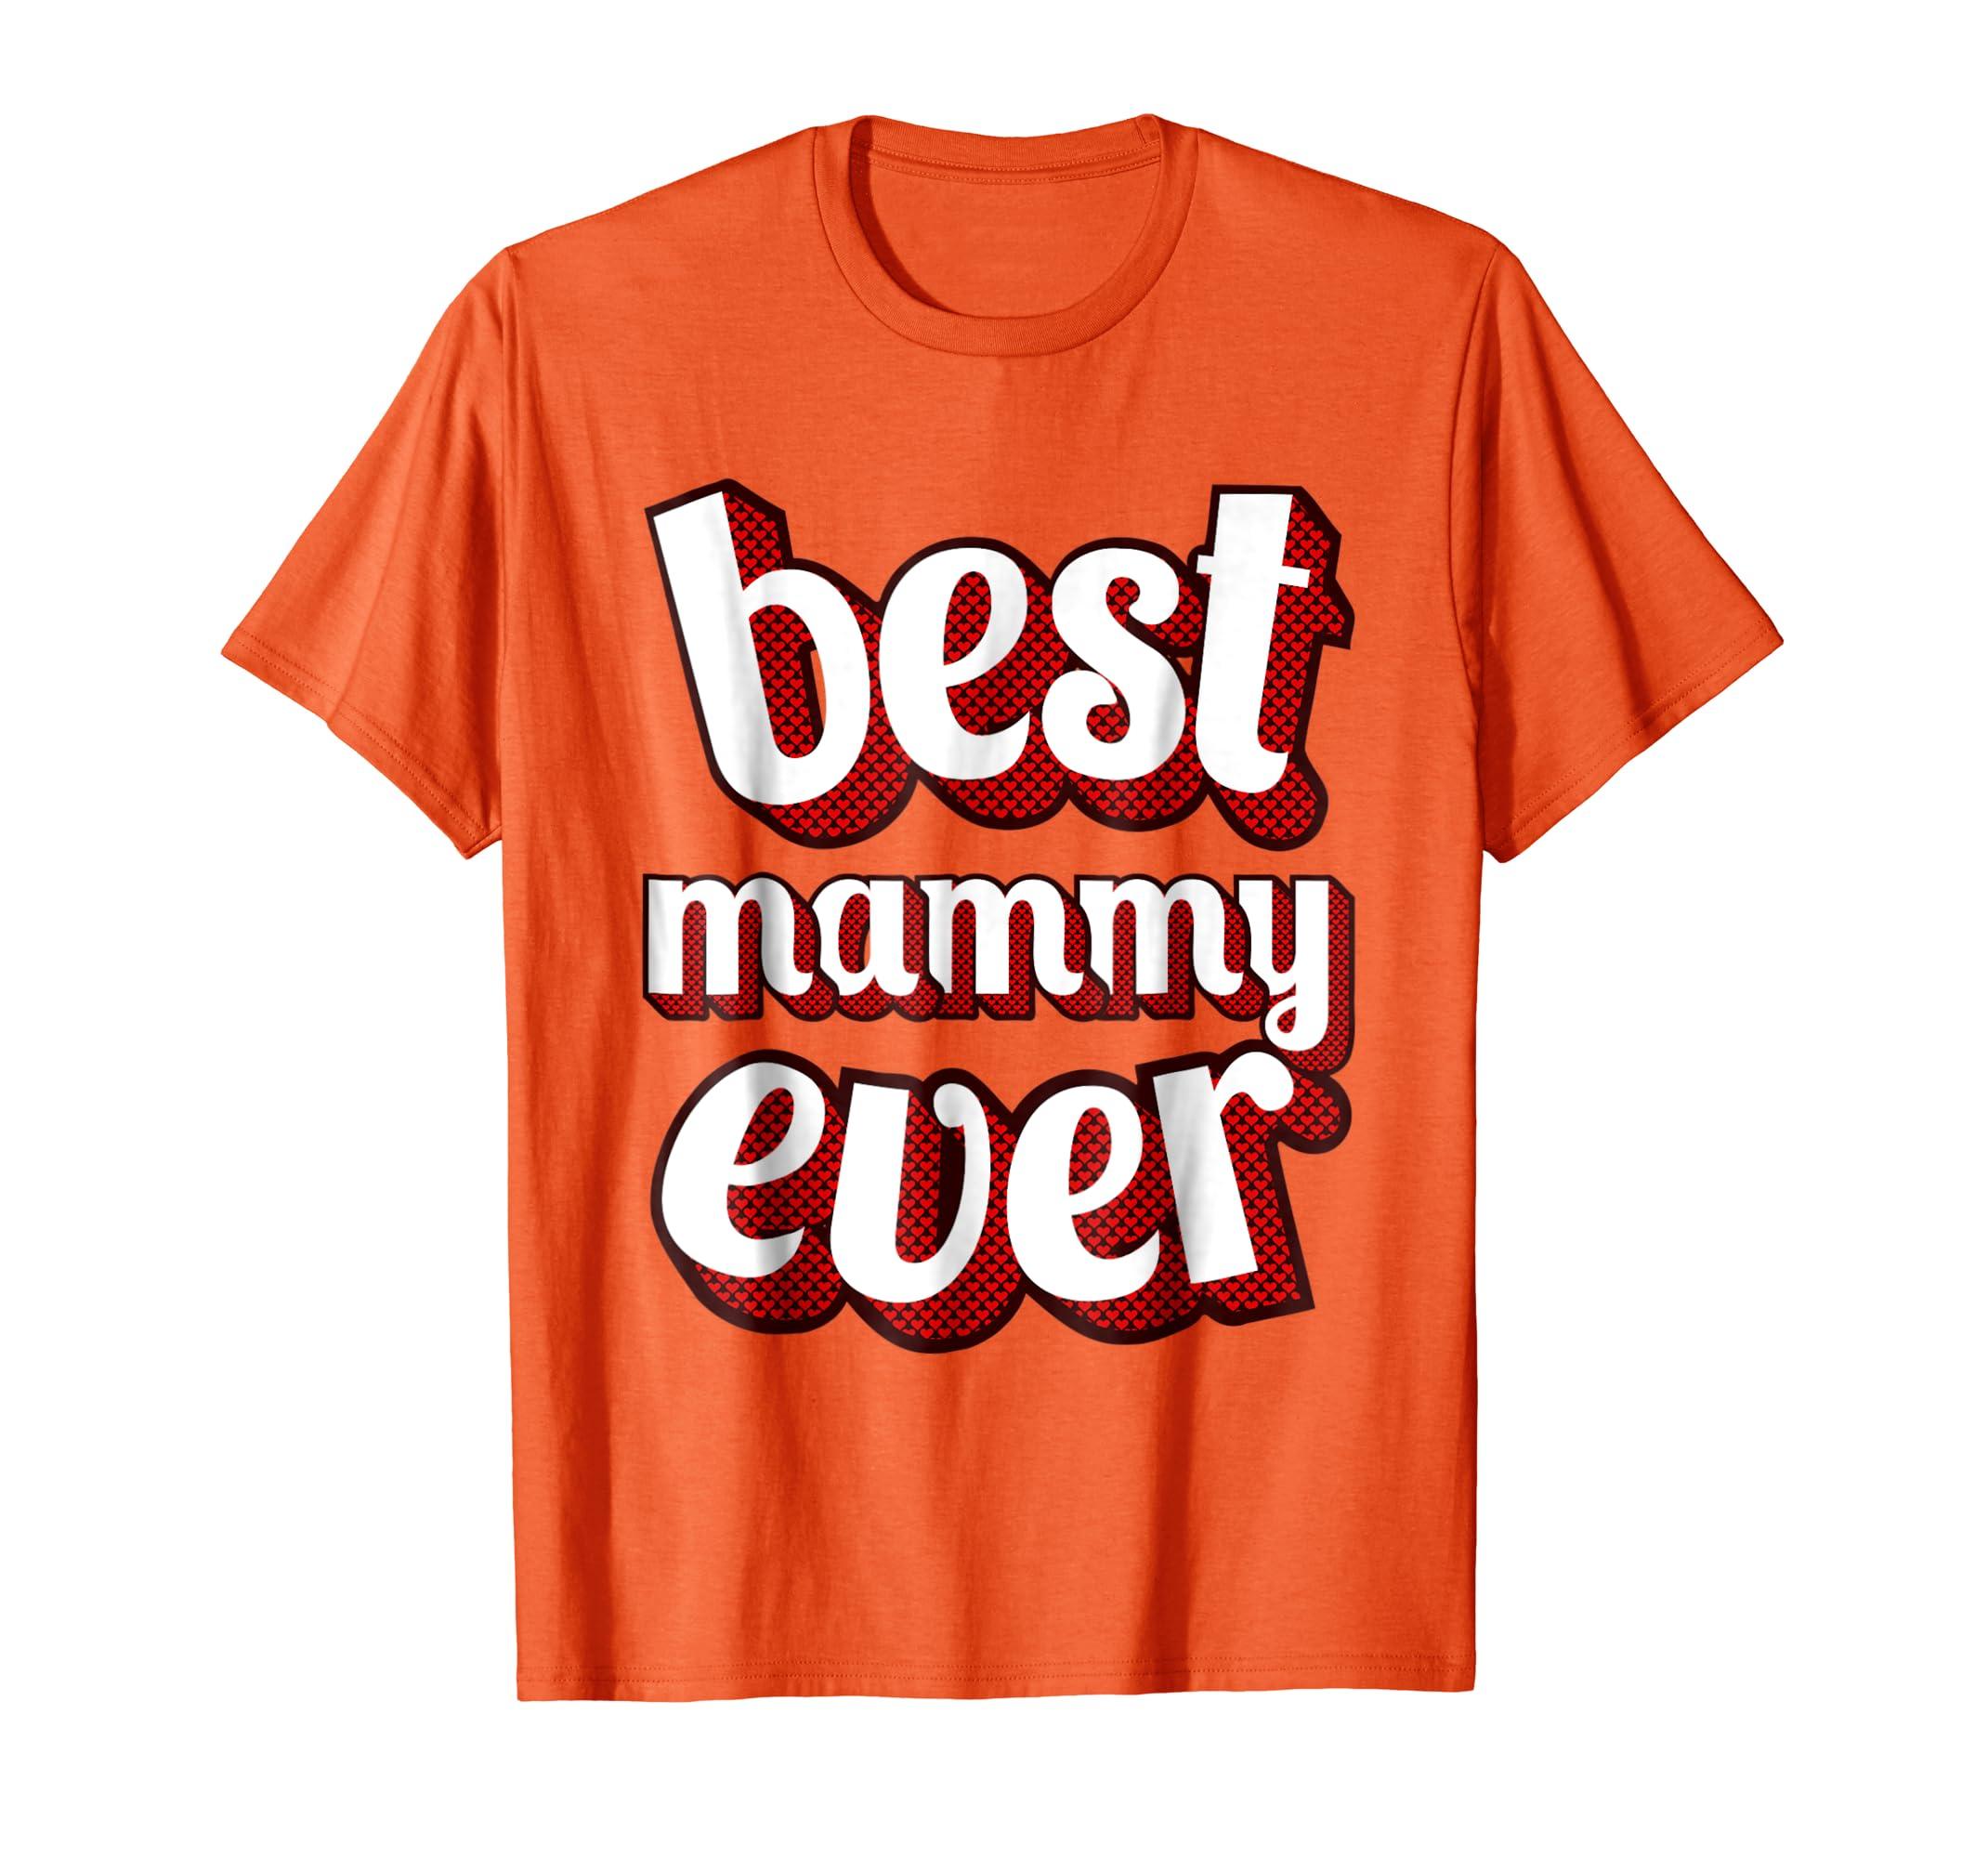 c1944bca3 ... Best Mammy Ever Vintage T Shirt Retro Classic Graphic Design-prm ...